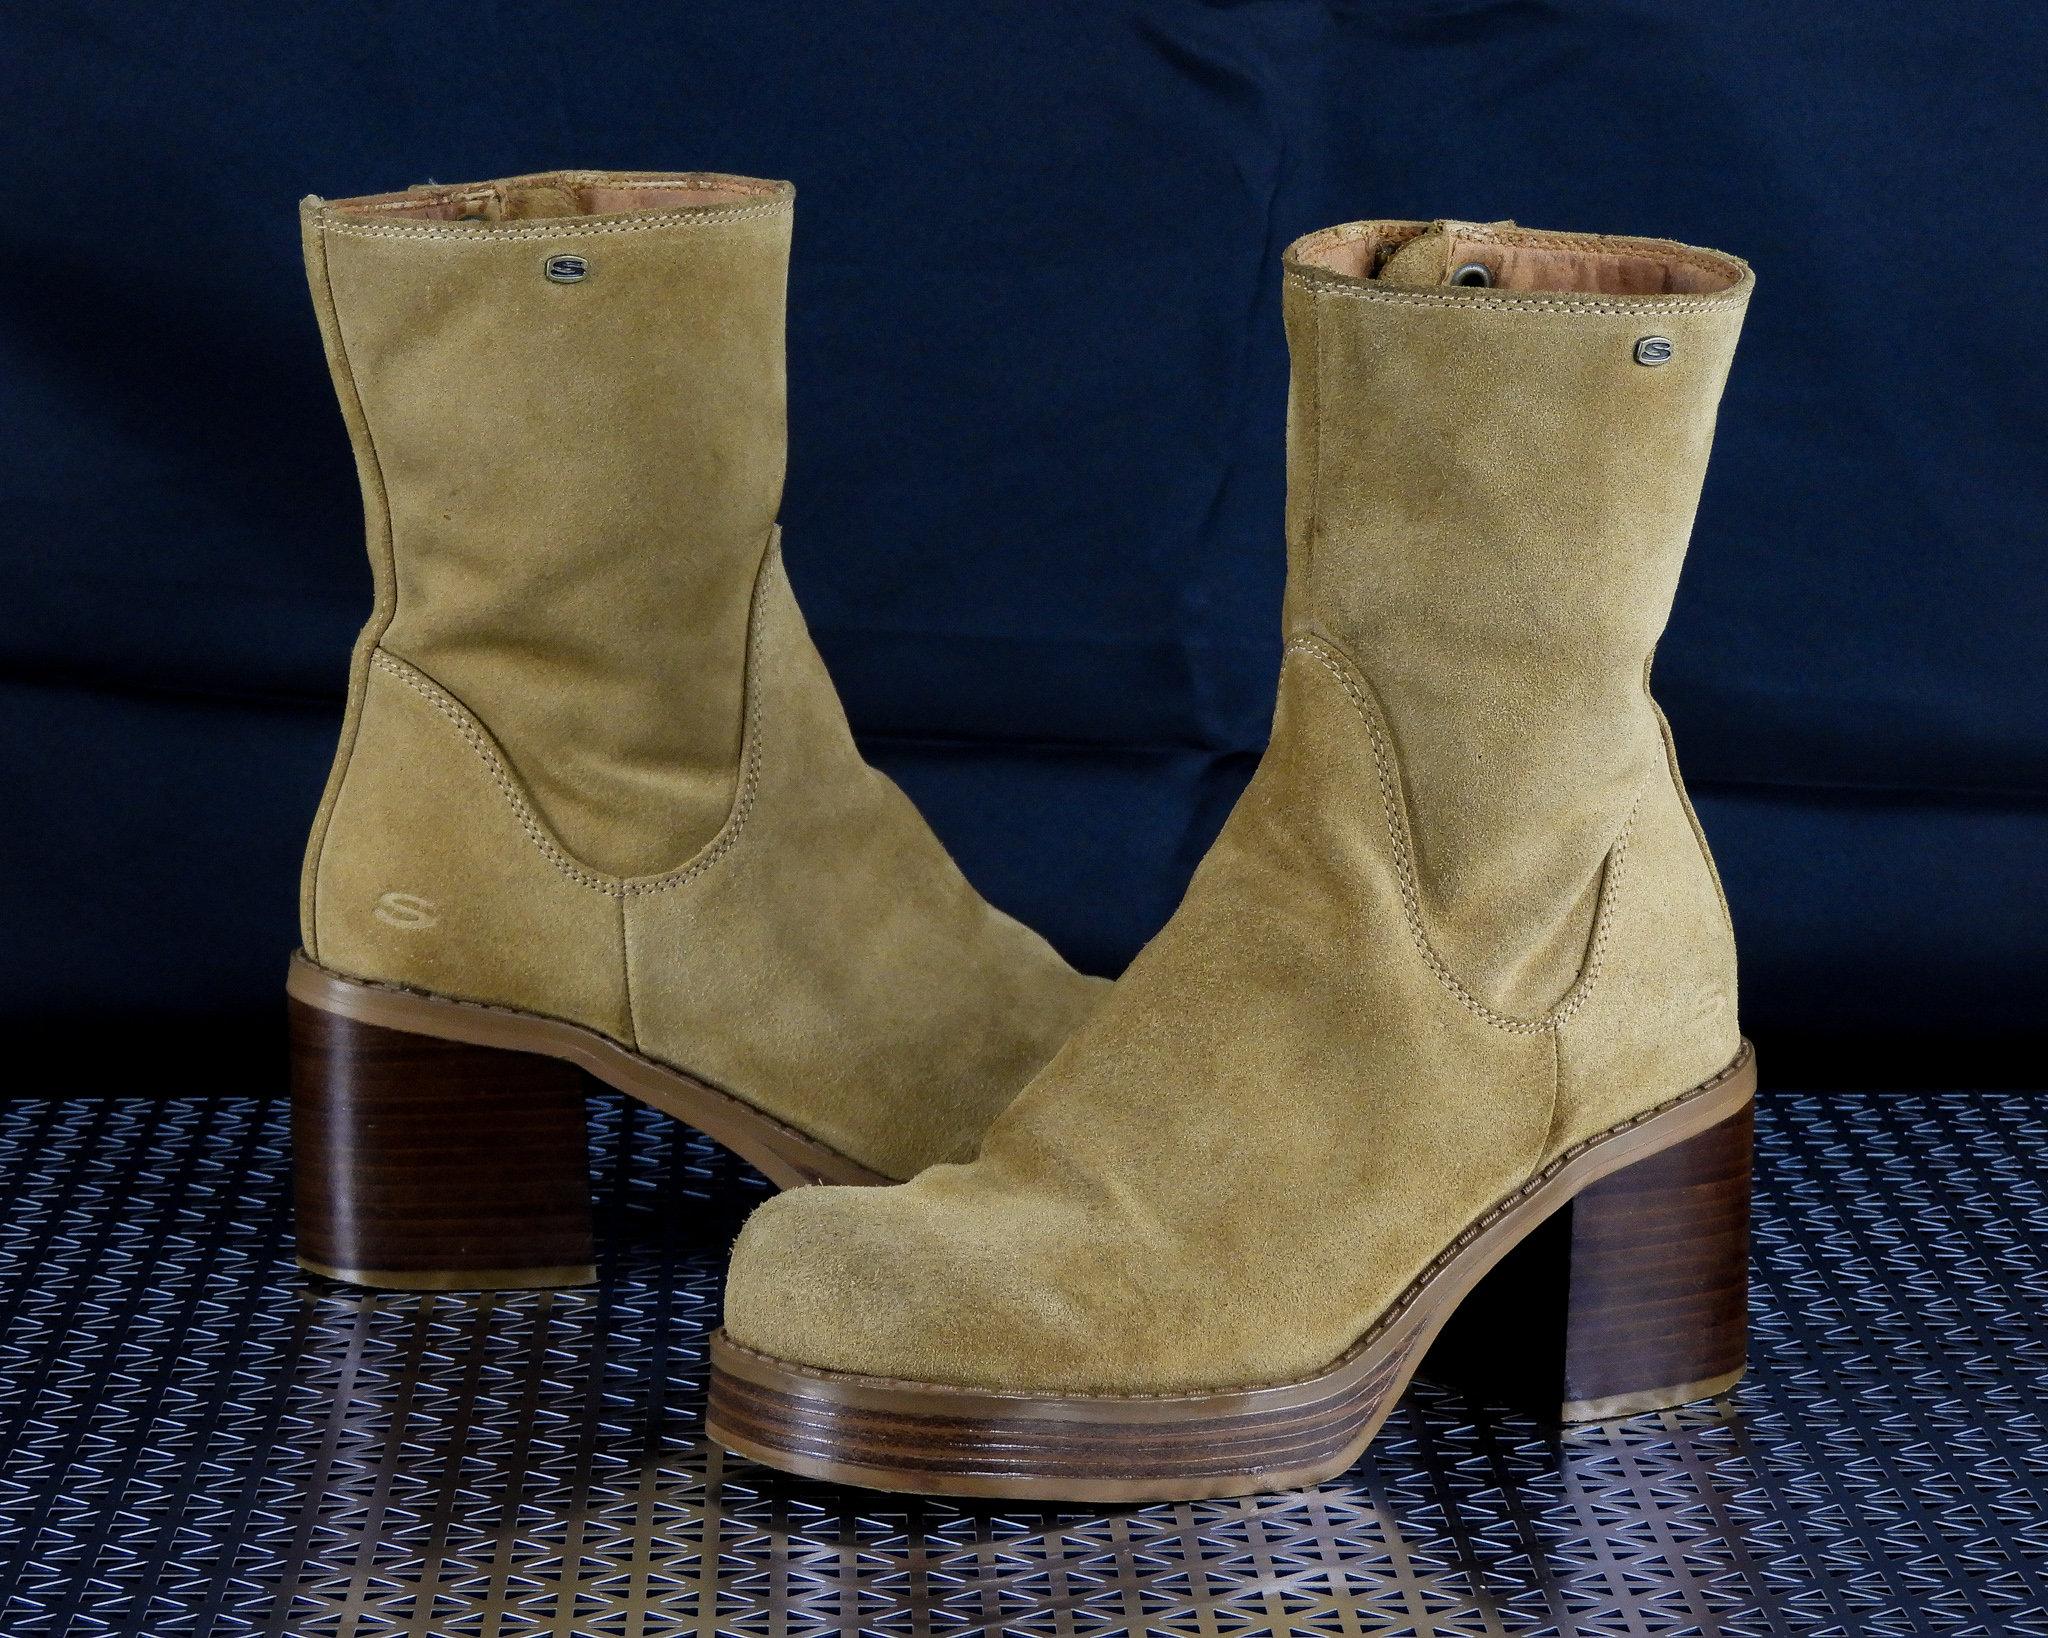 Vintage Platform Boots, Chunky Heels